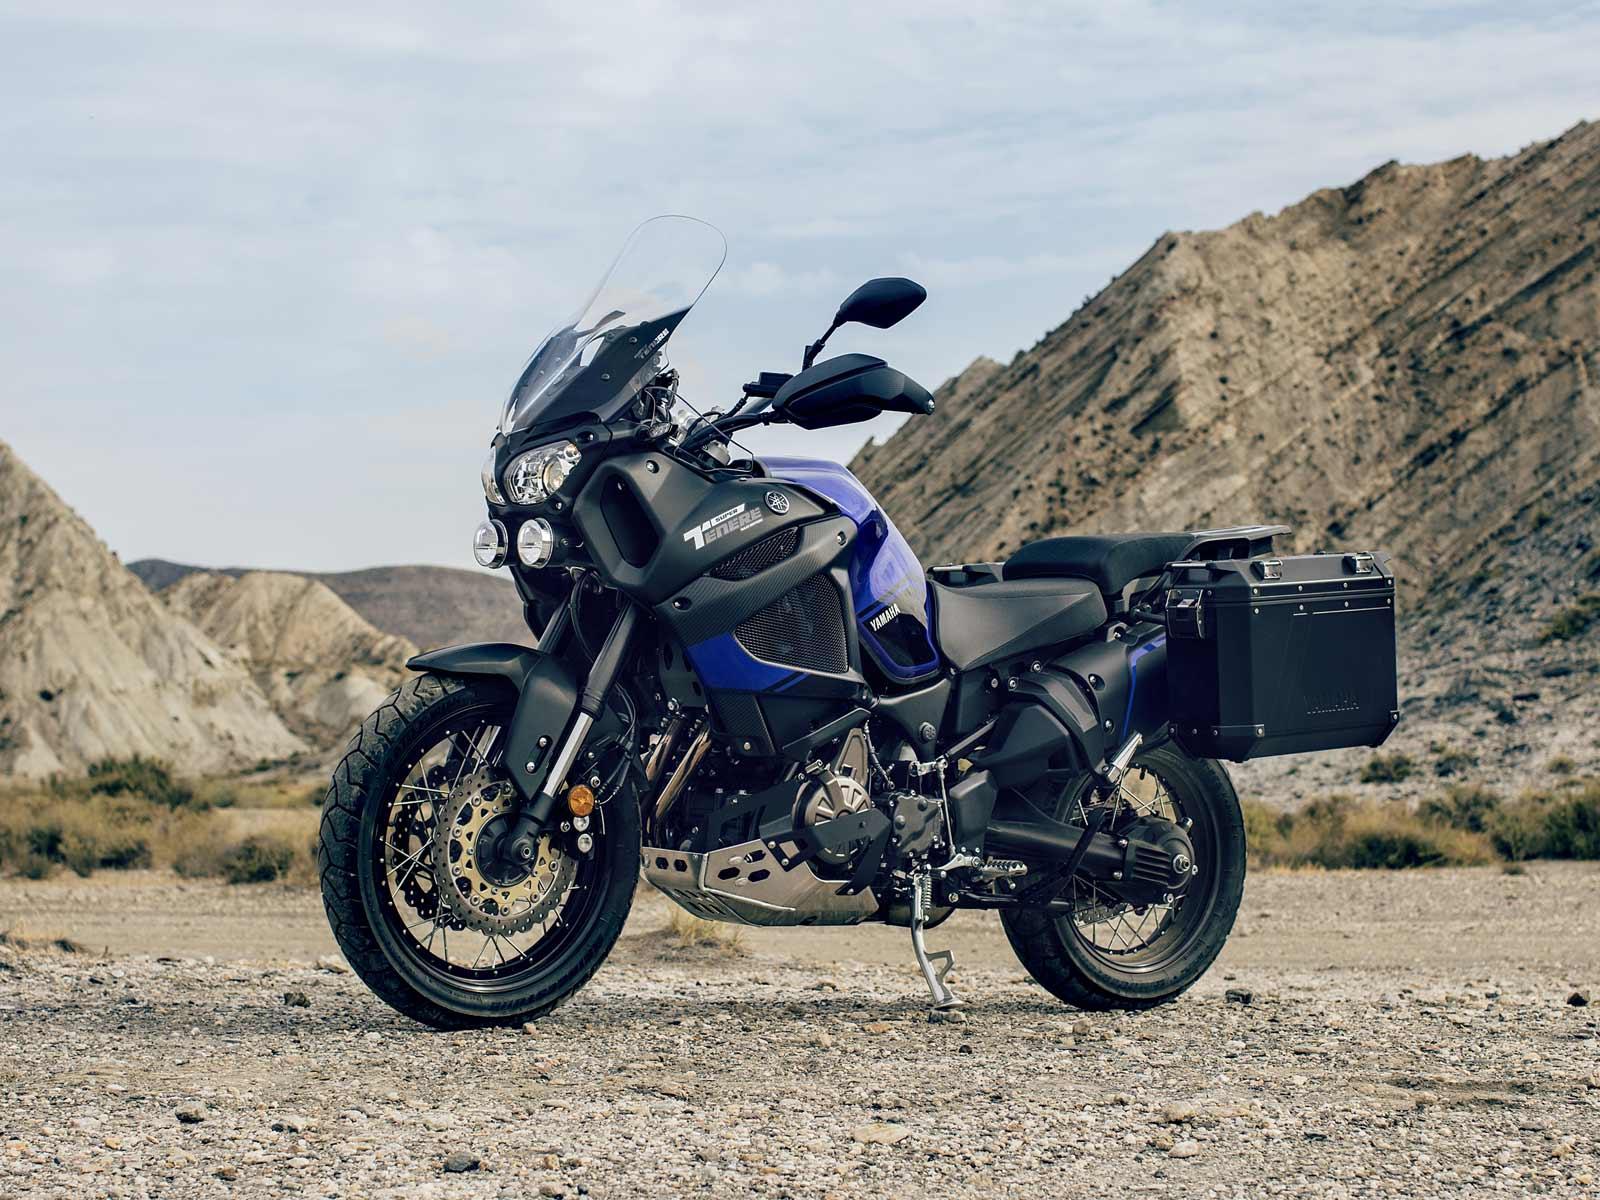 Мотоцикл Yamaha XT 1200 Z SUPER TENERE 2012 Цена, Фото